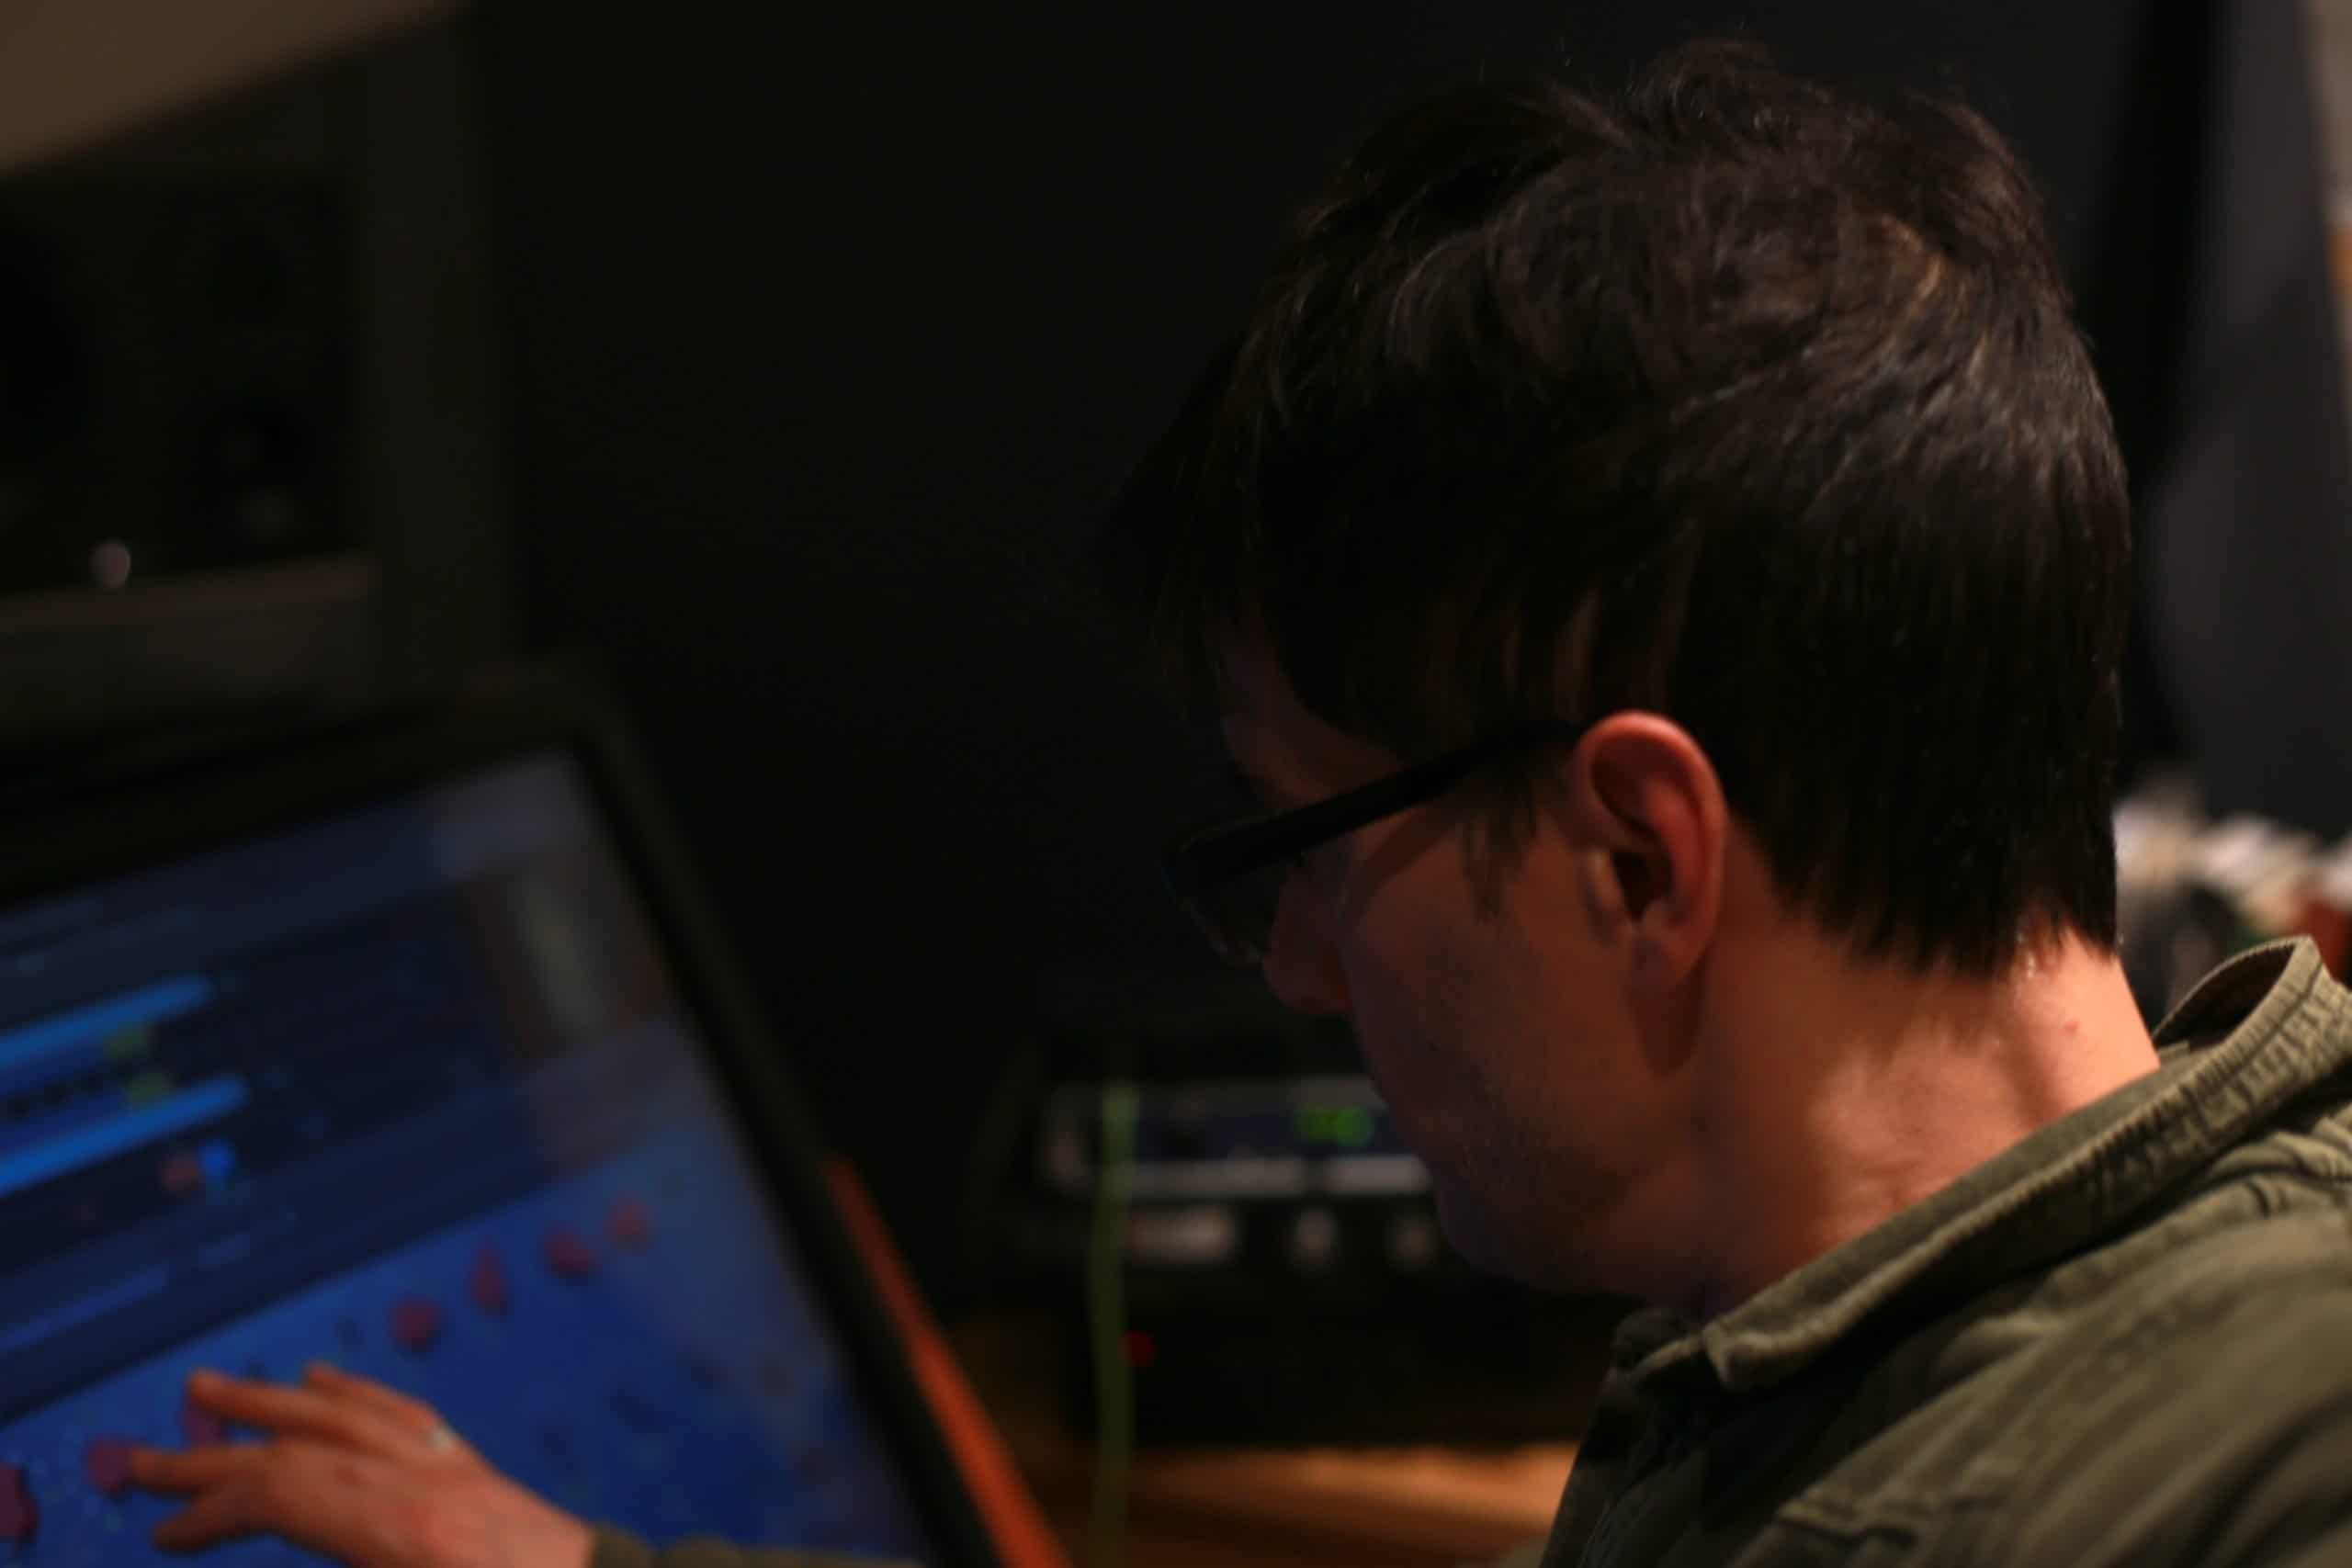 IMG 7989 1 scaled 1 - Stellar Sound Labs Music Mastering